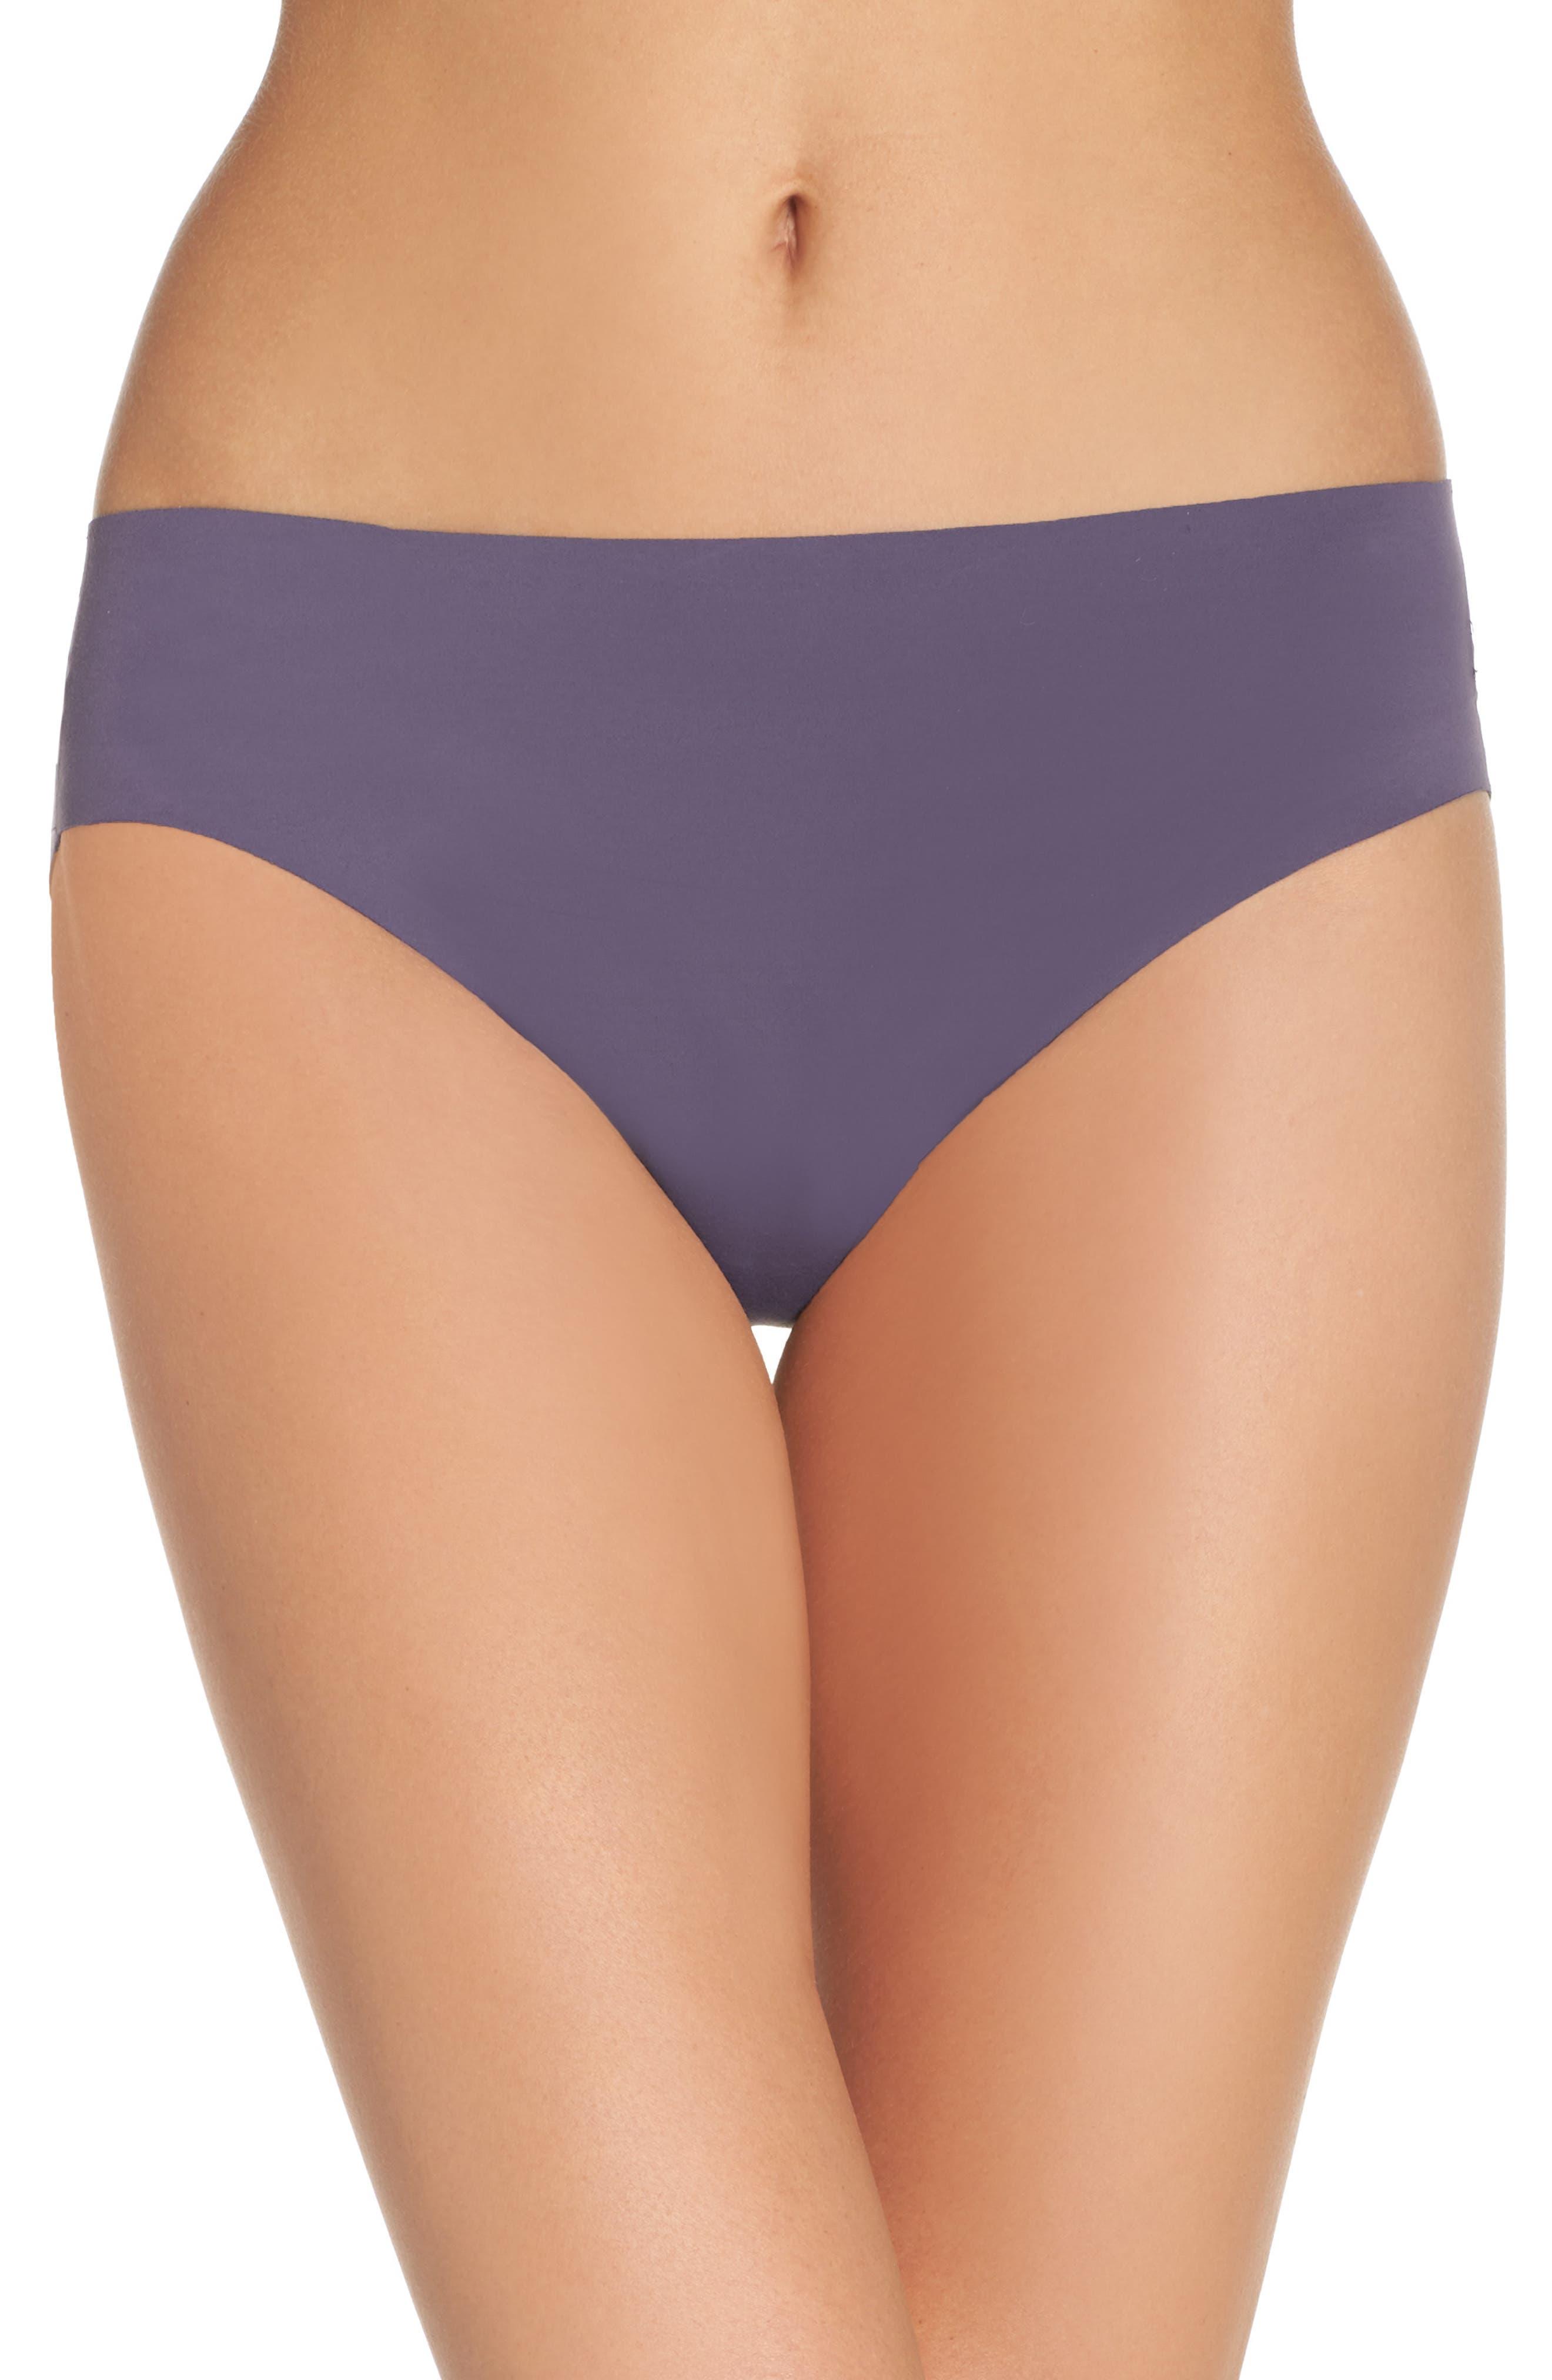 Undie-tectable B'tweenie Panty,                             Main thumbnail 1, color,                             Oxidized Purple